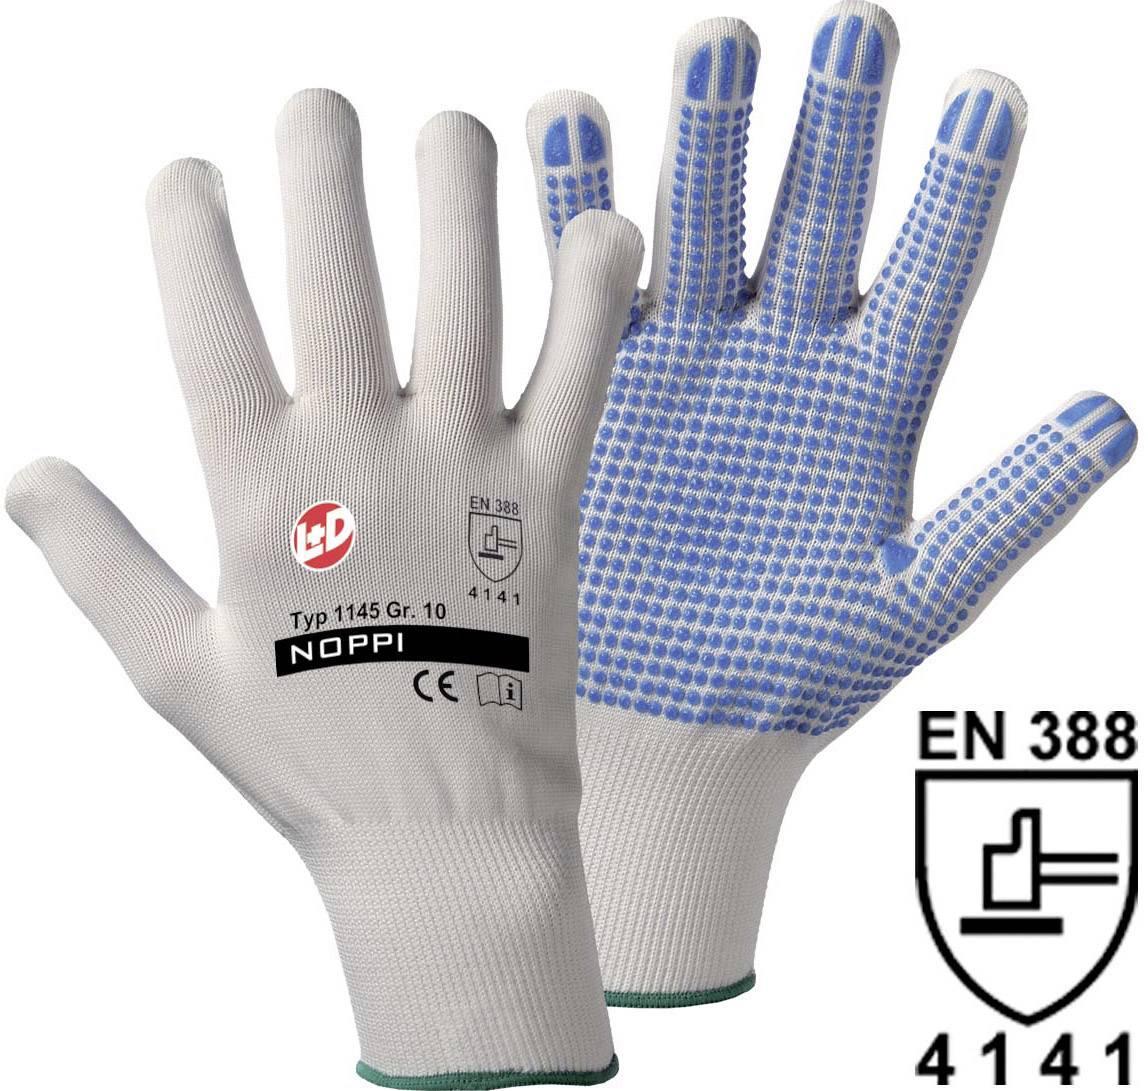 Pracovné rukavice Leipold + Döhle NOPPI 1145, velikost rukavic: 8, M